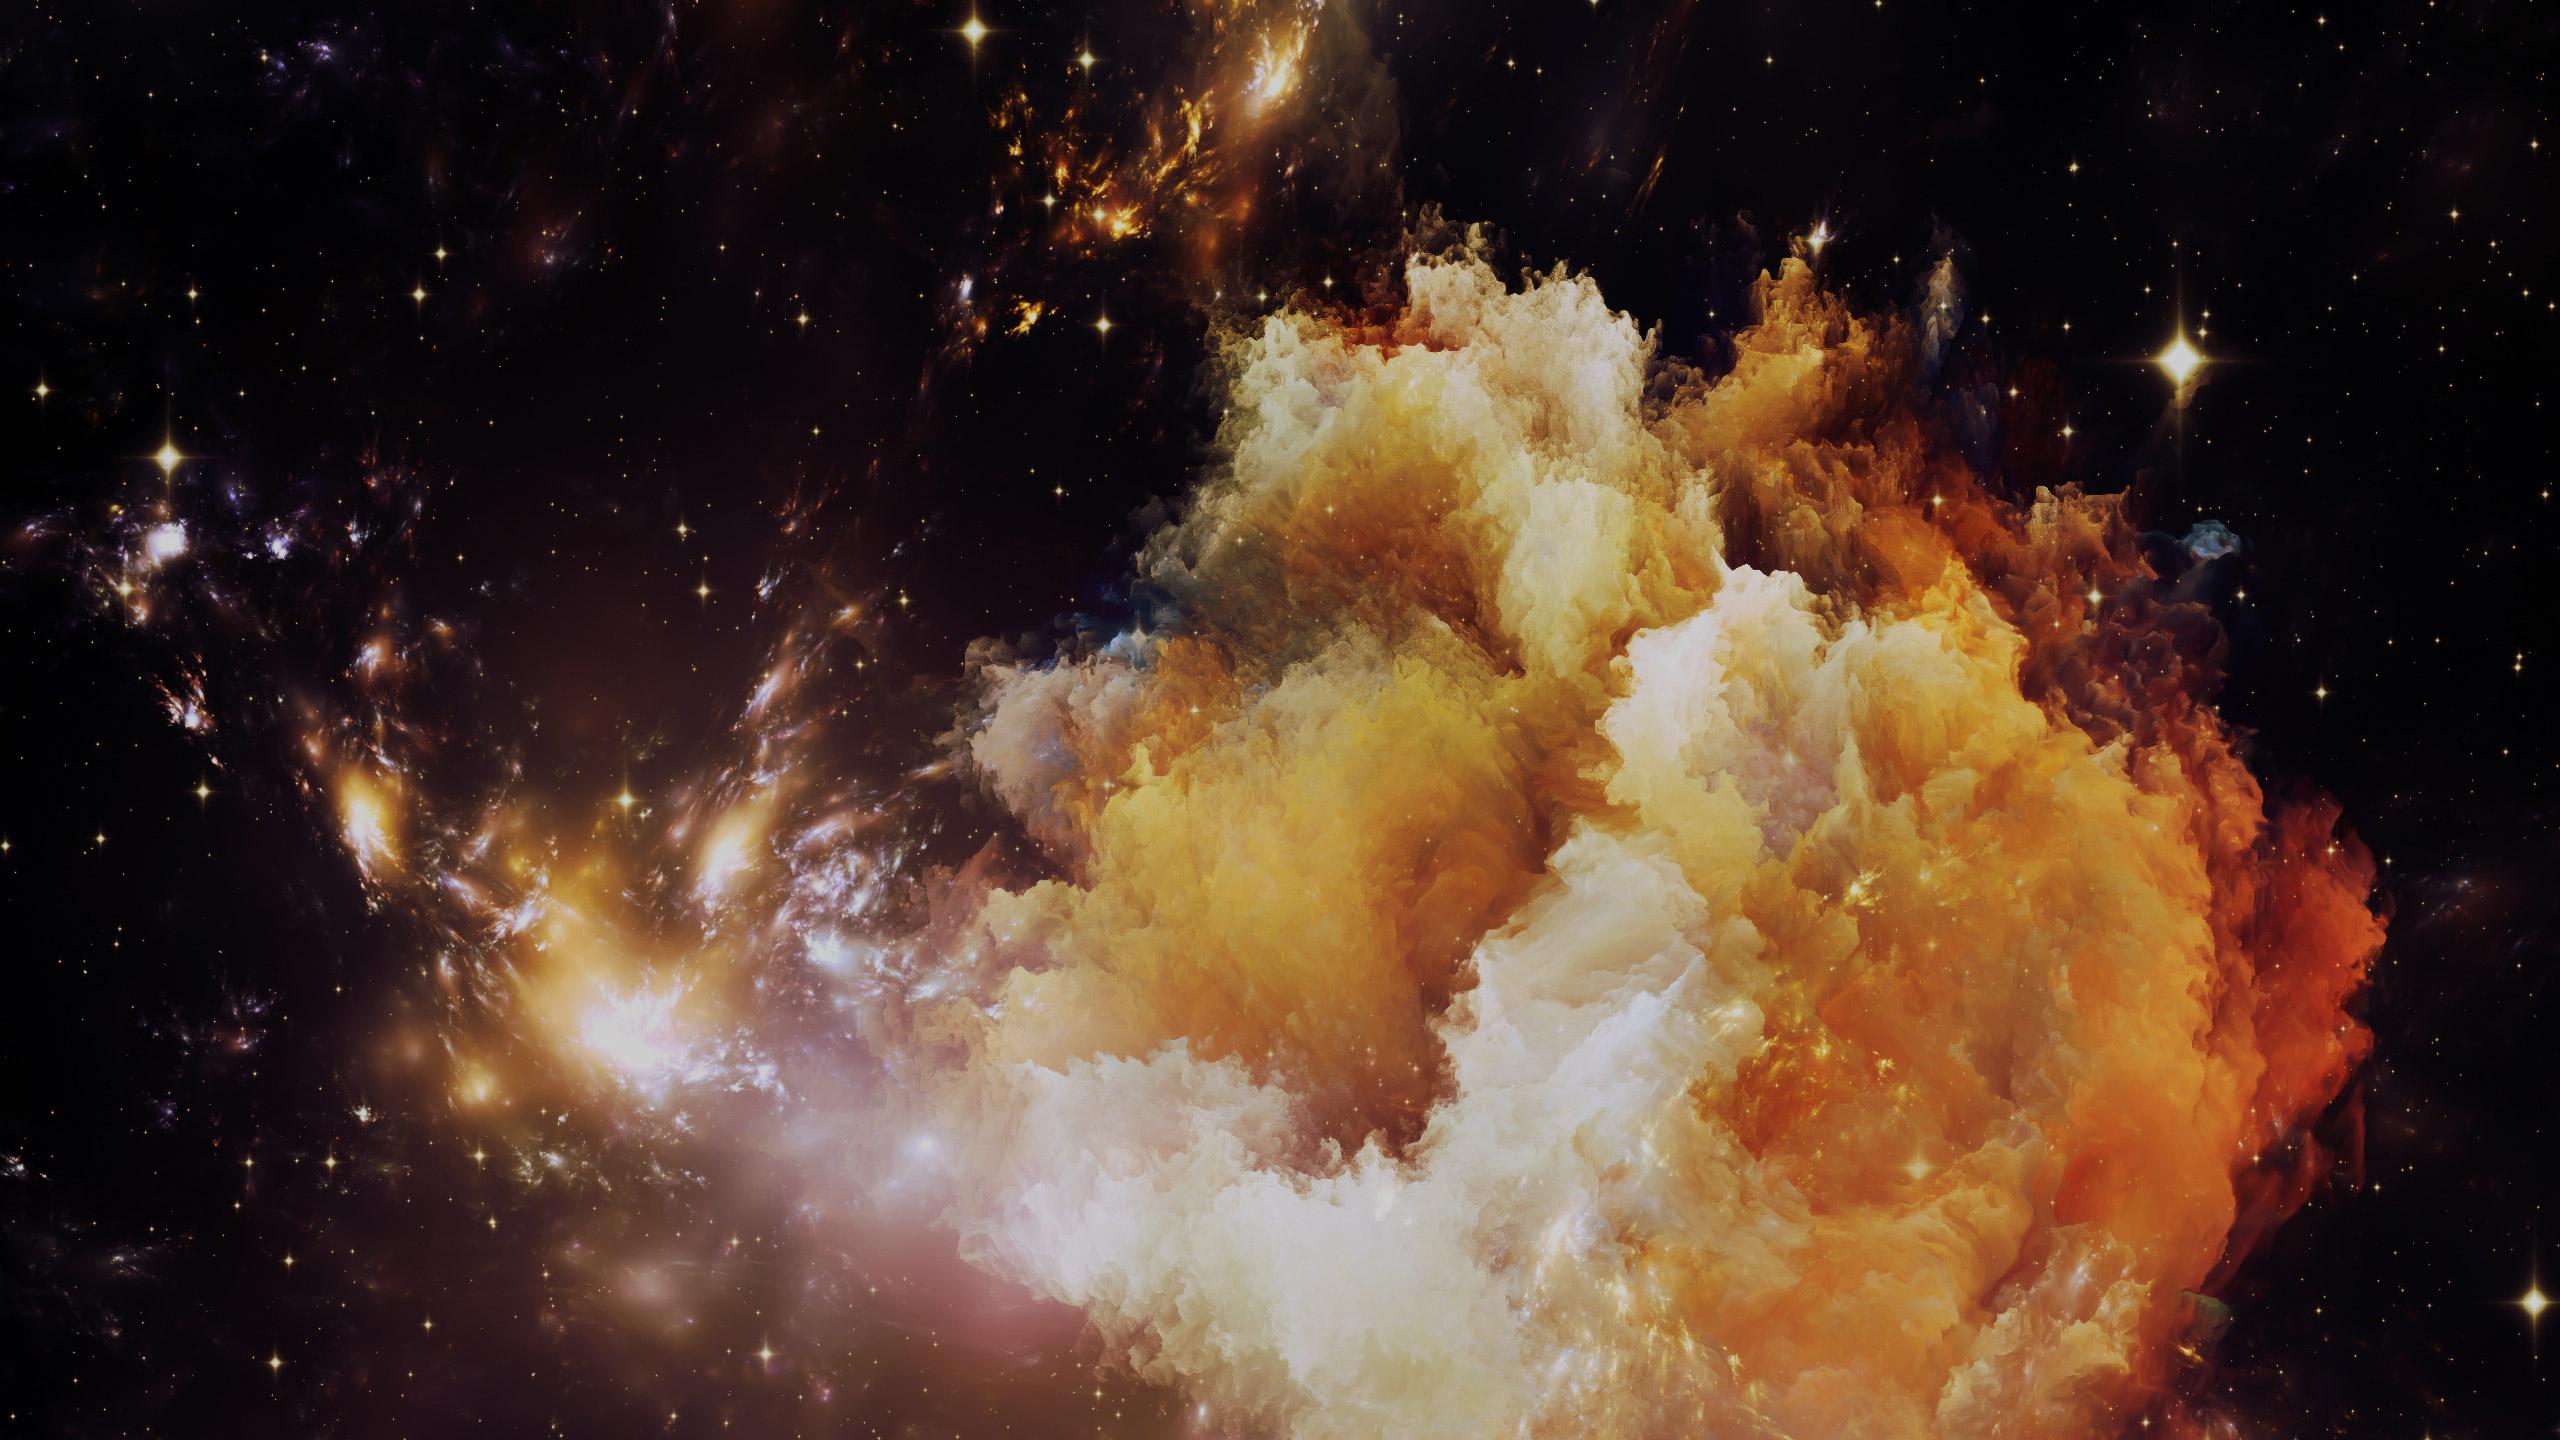 sliderbg-2540x1440px-supernova